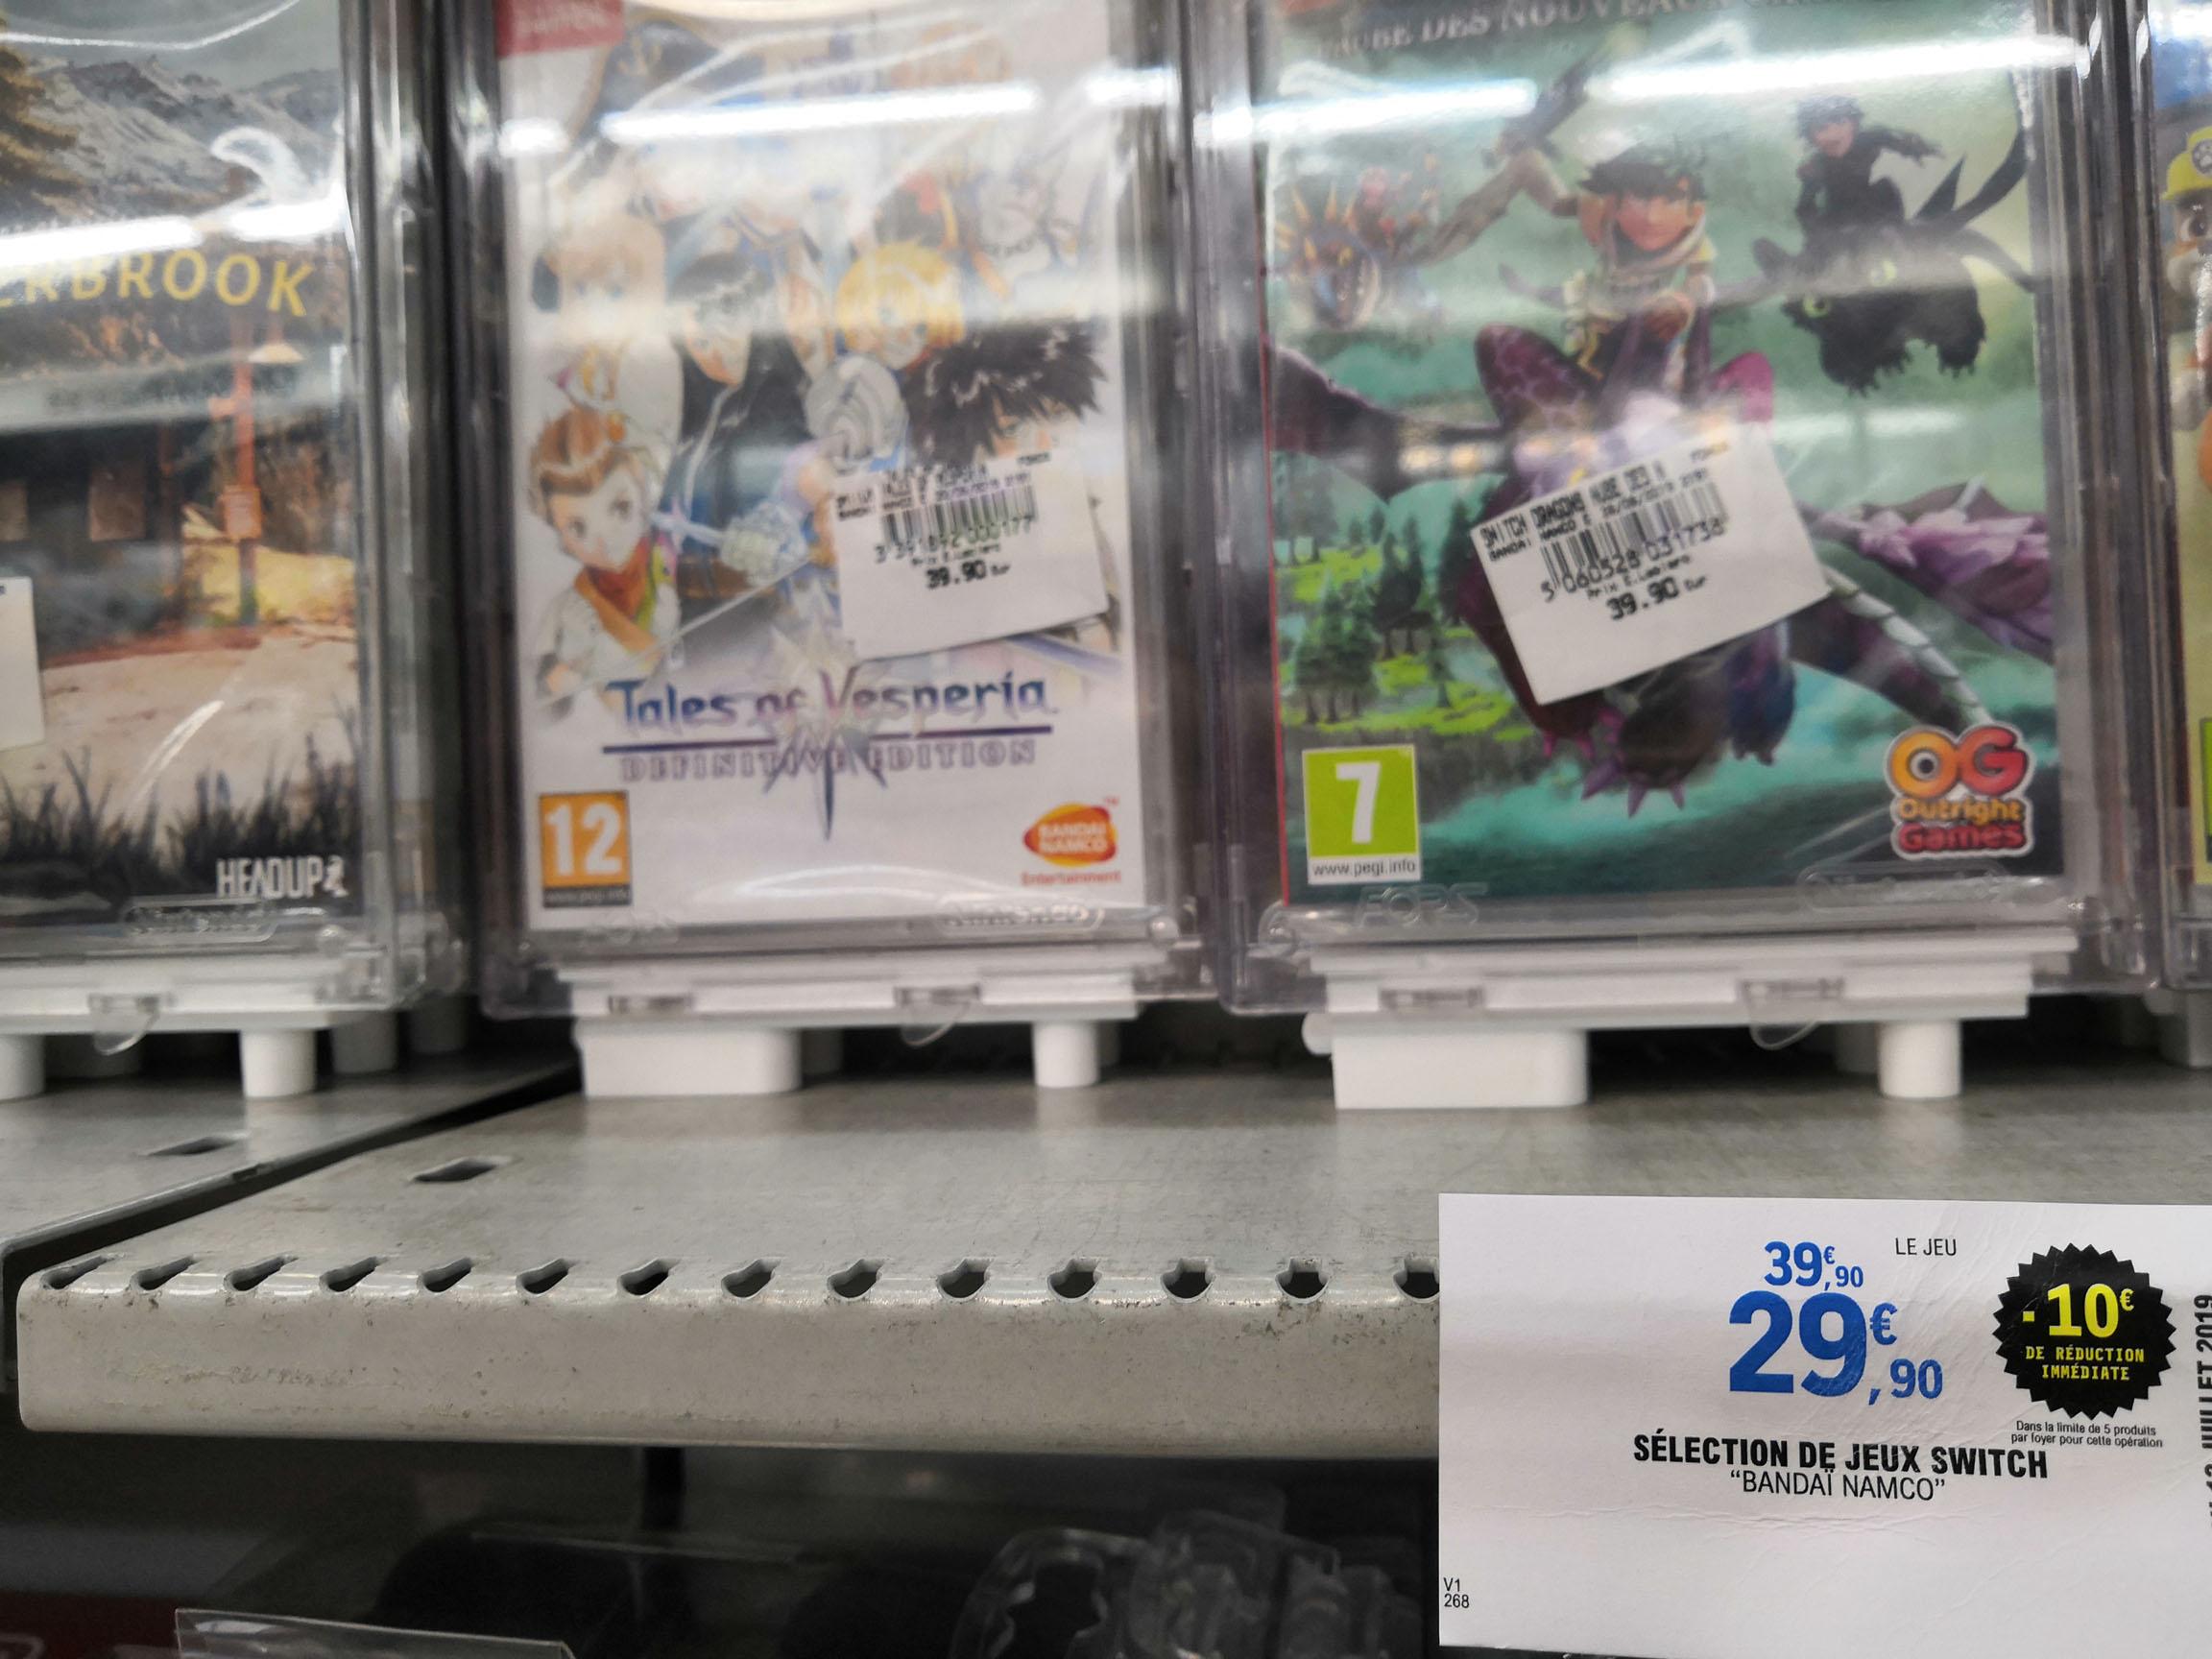 Jeu Tales of Vesperia sur Nintendo Switch - Leclerc de Bollène (84)